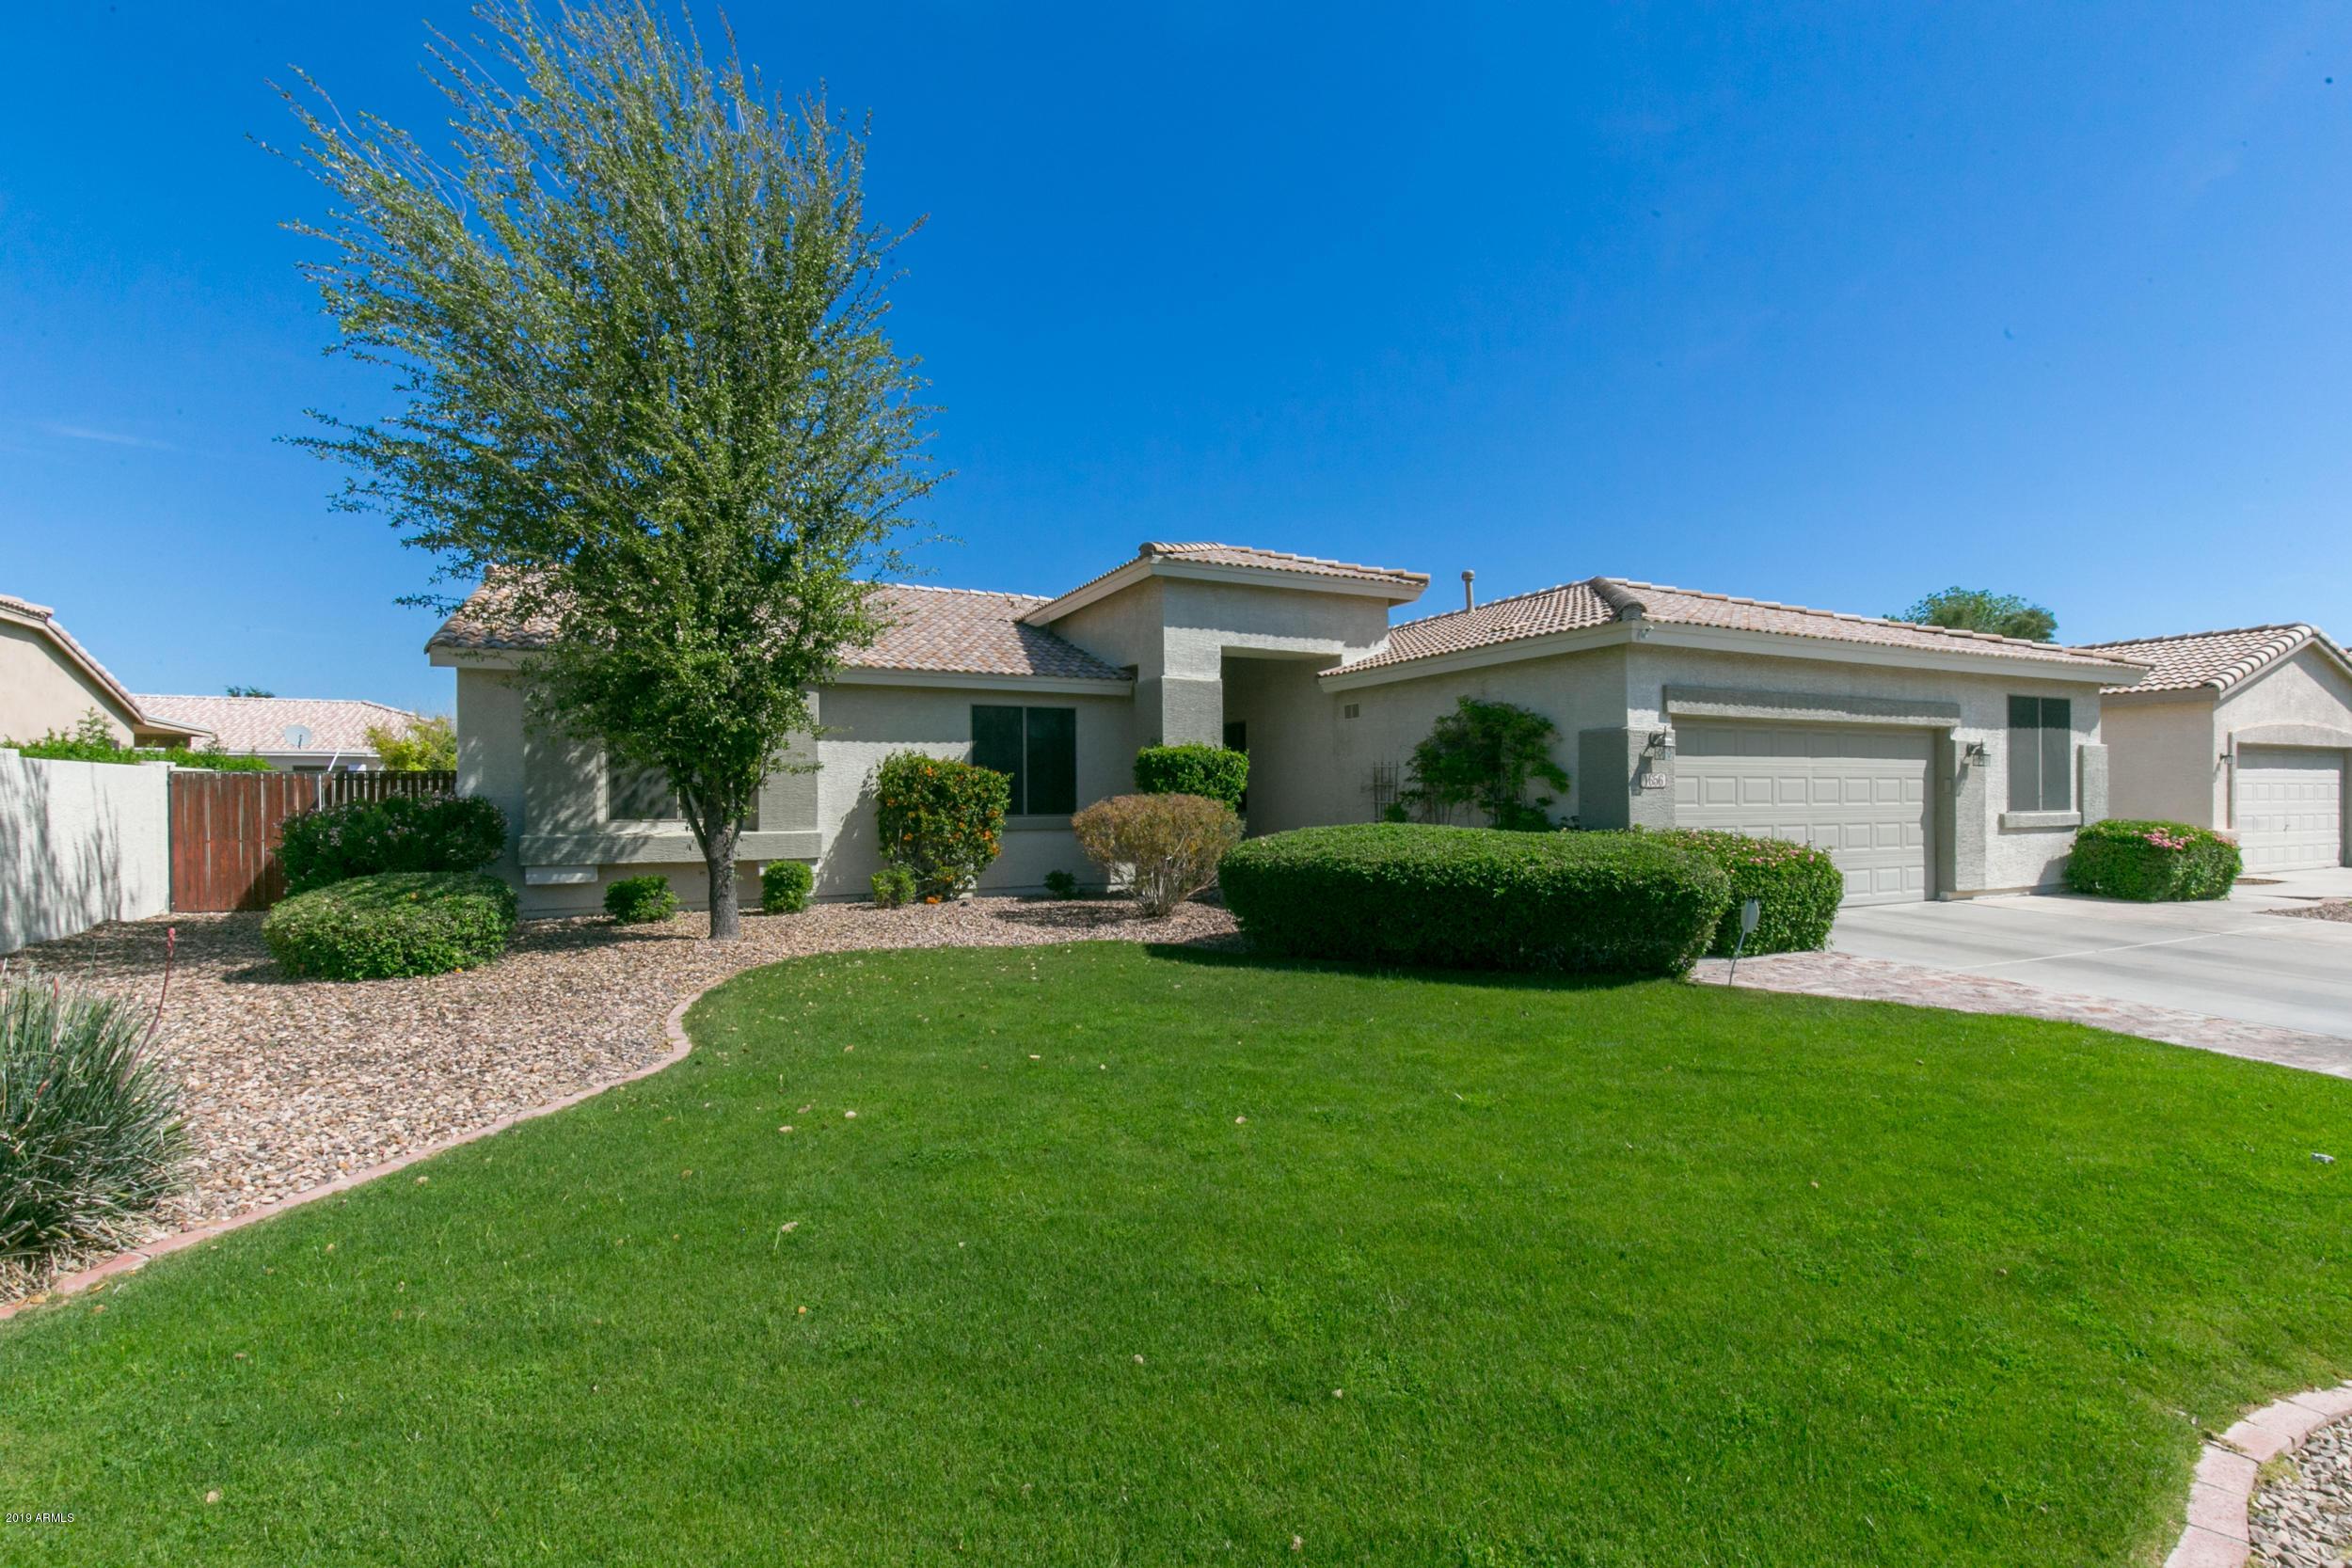 Photo of 1656 E KRAMER Street, Mesa, AZ 85203